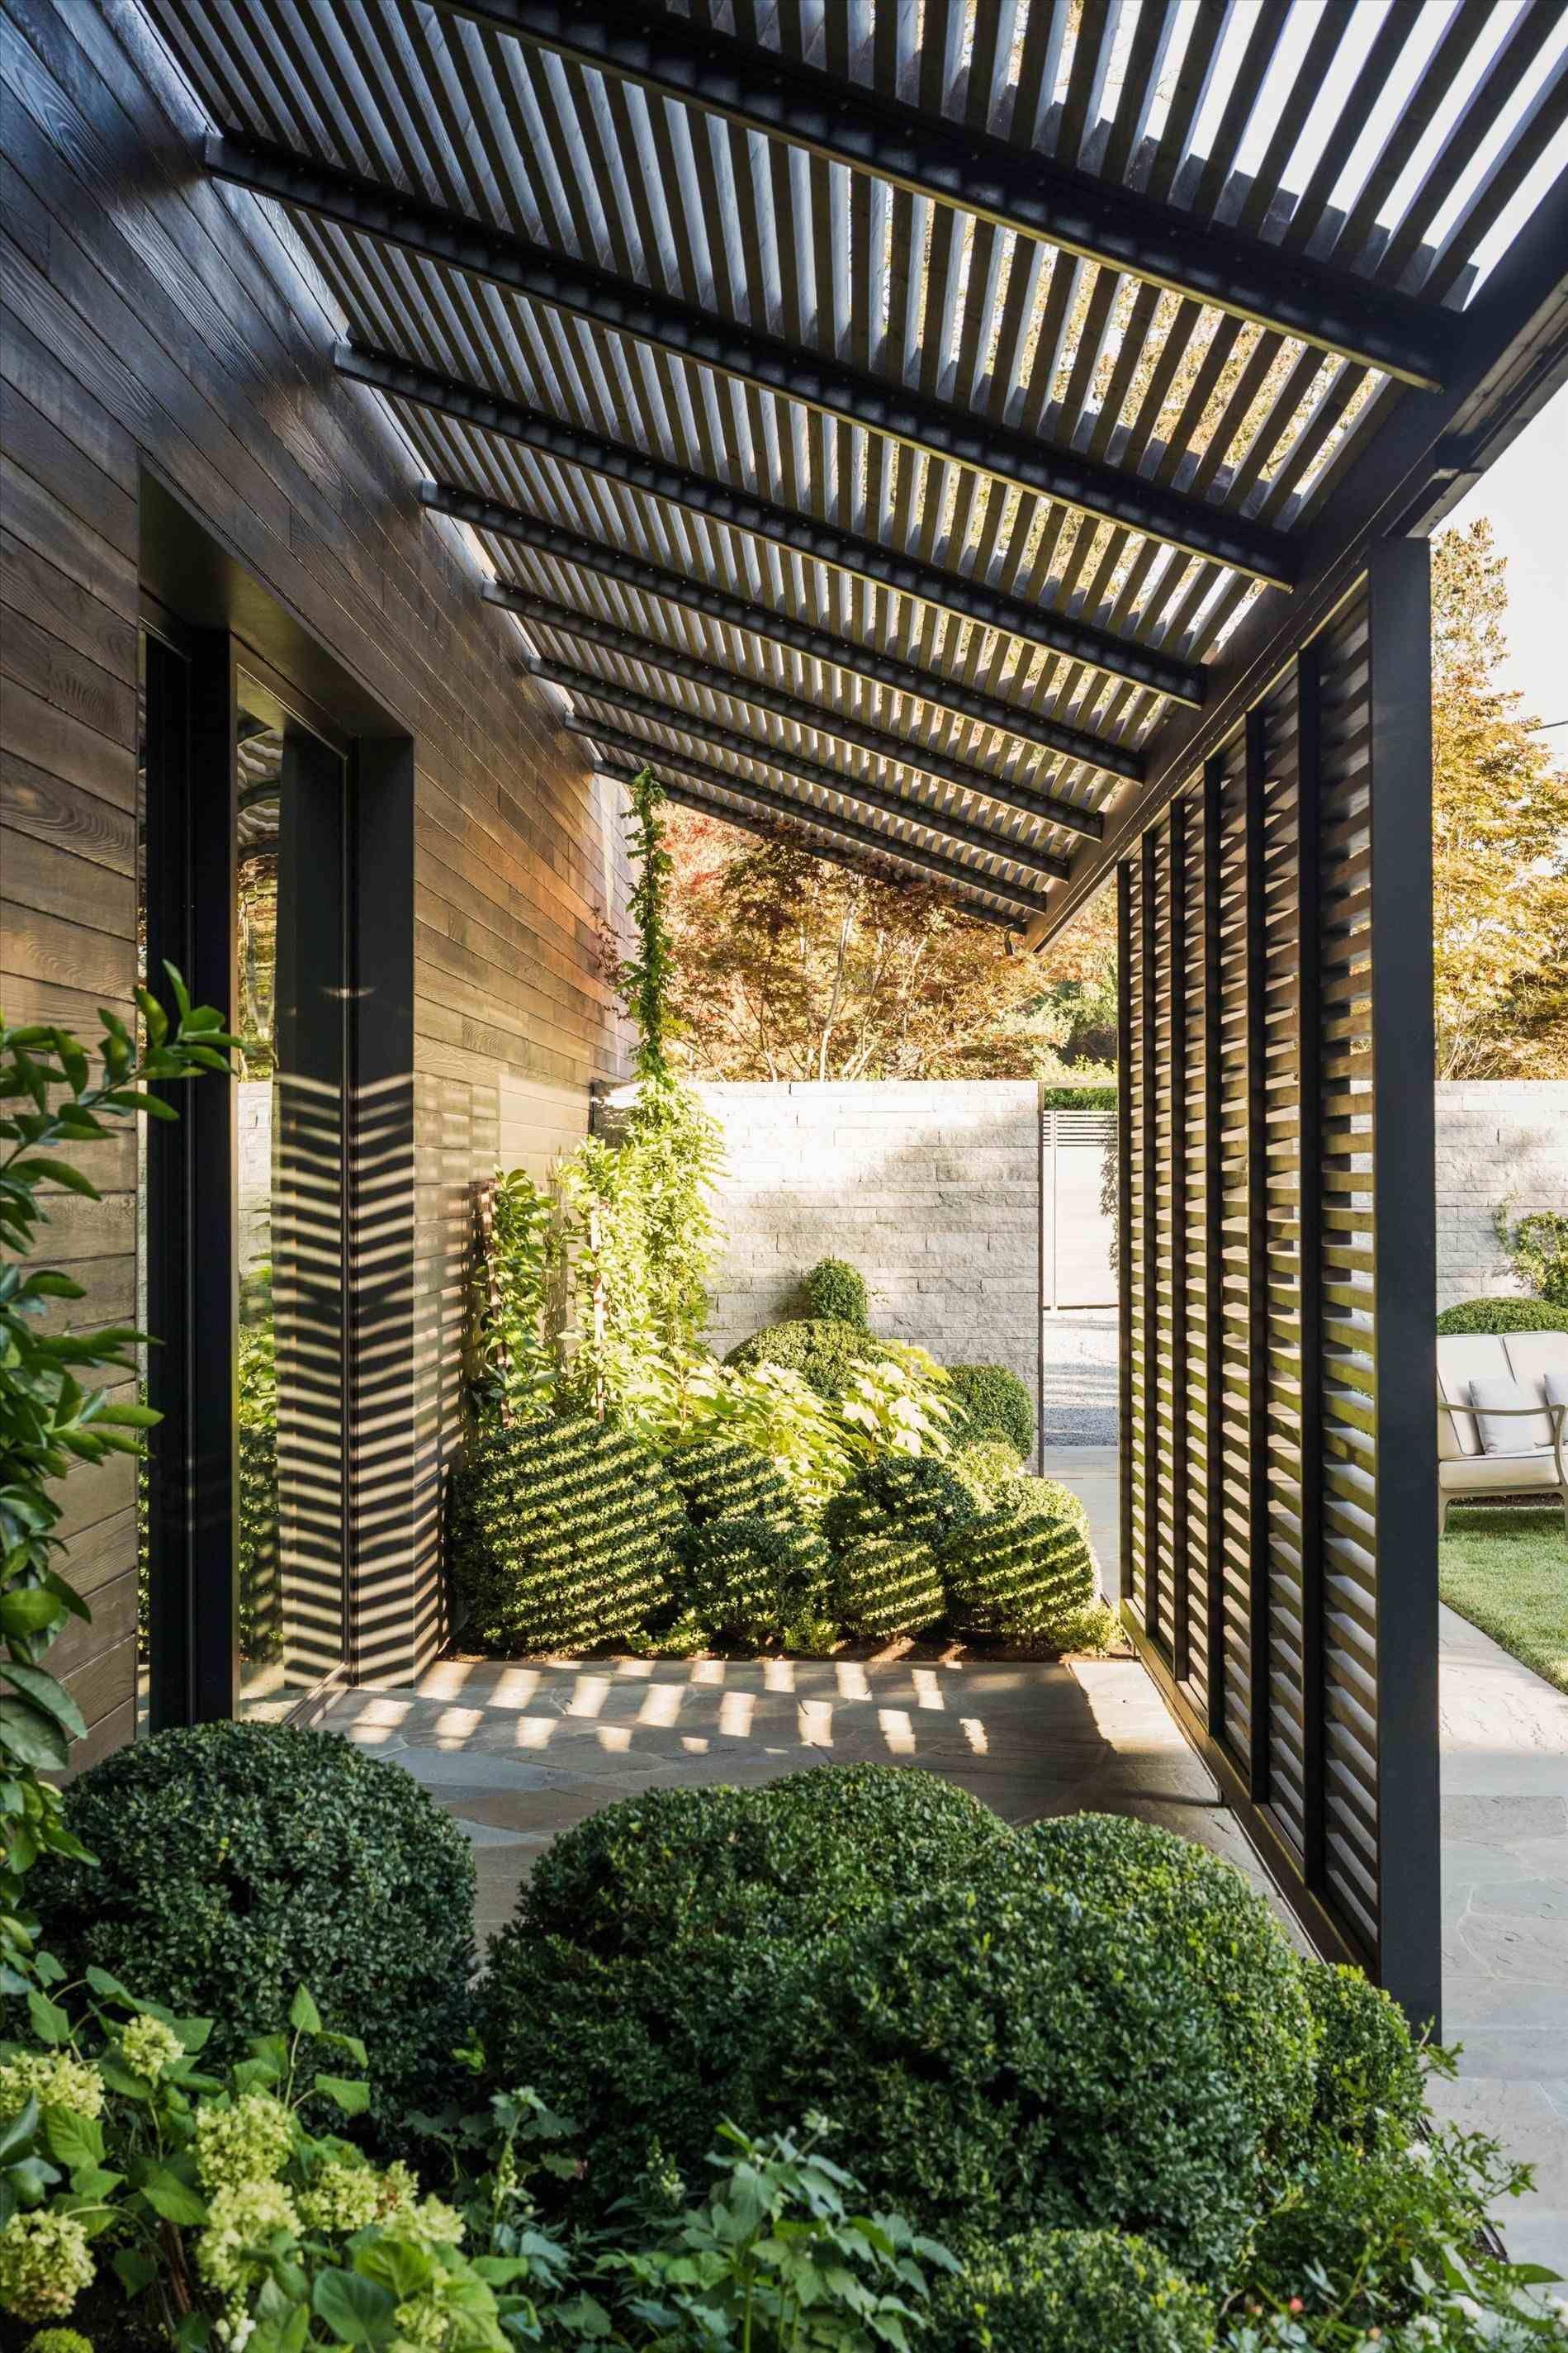 Roofing Garden Beautiful Home Roof Ideas Pergola Outdoor Rooms Backyard